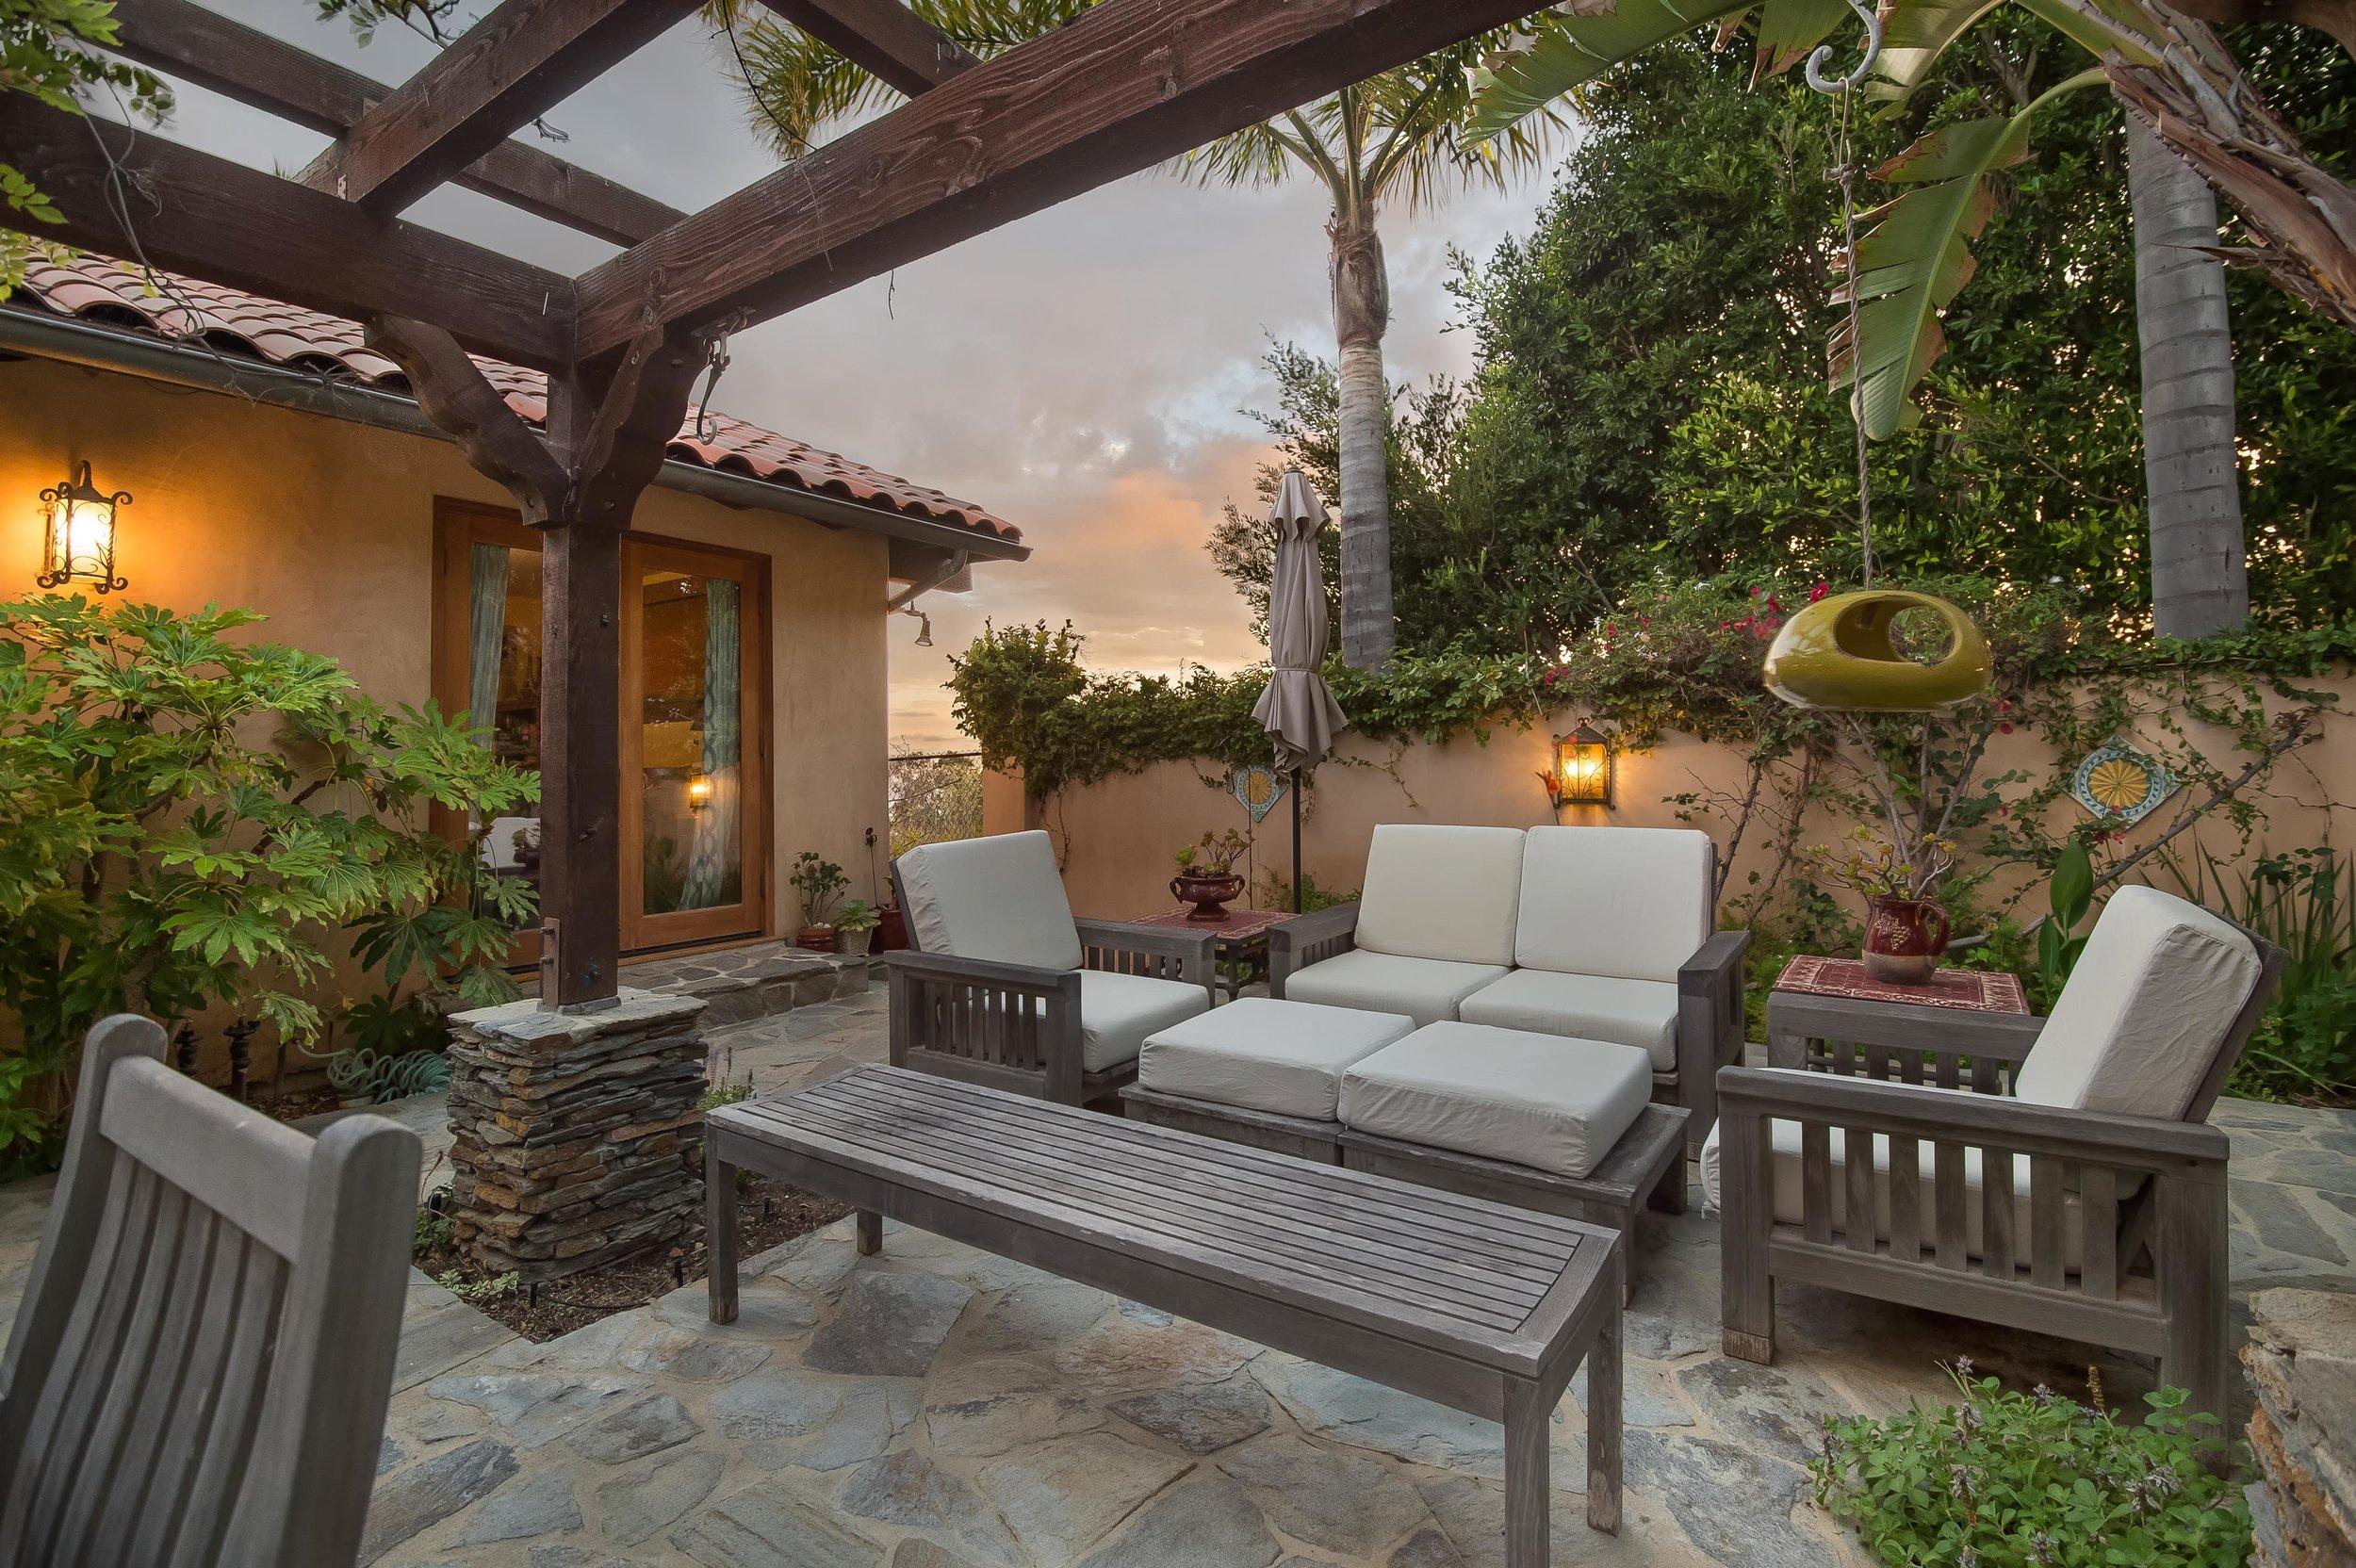 009 patio 29660 Harvester Road Malibu For Sale The Malibu Life Team Luxury Real Estate.jpg